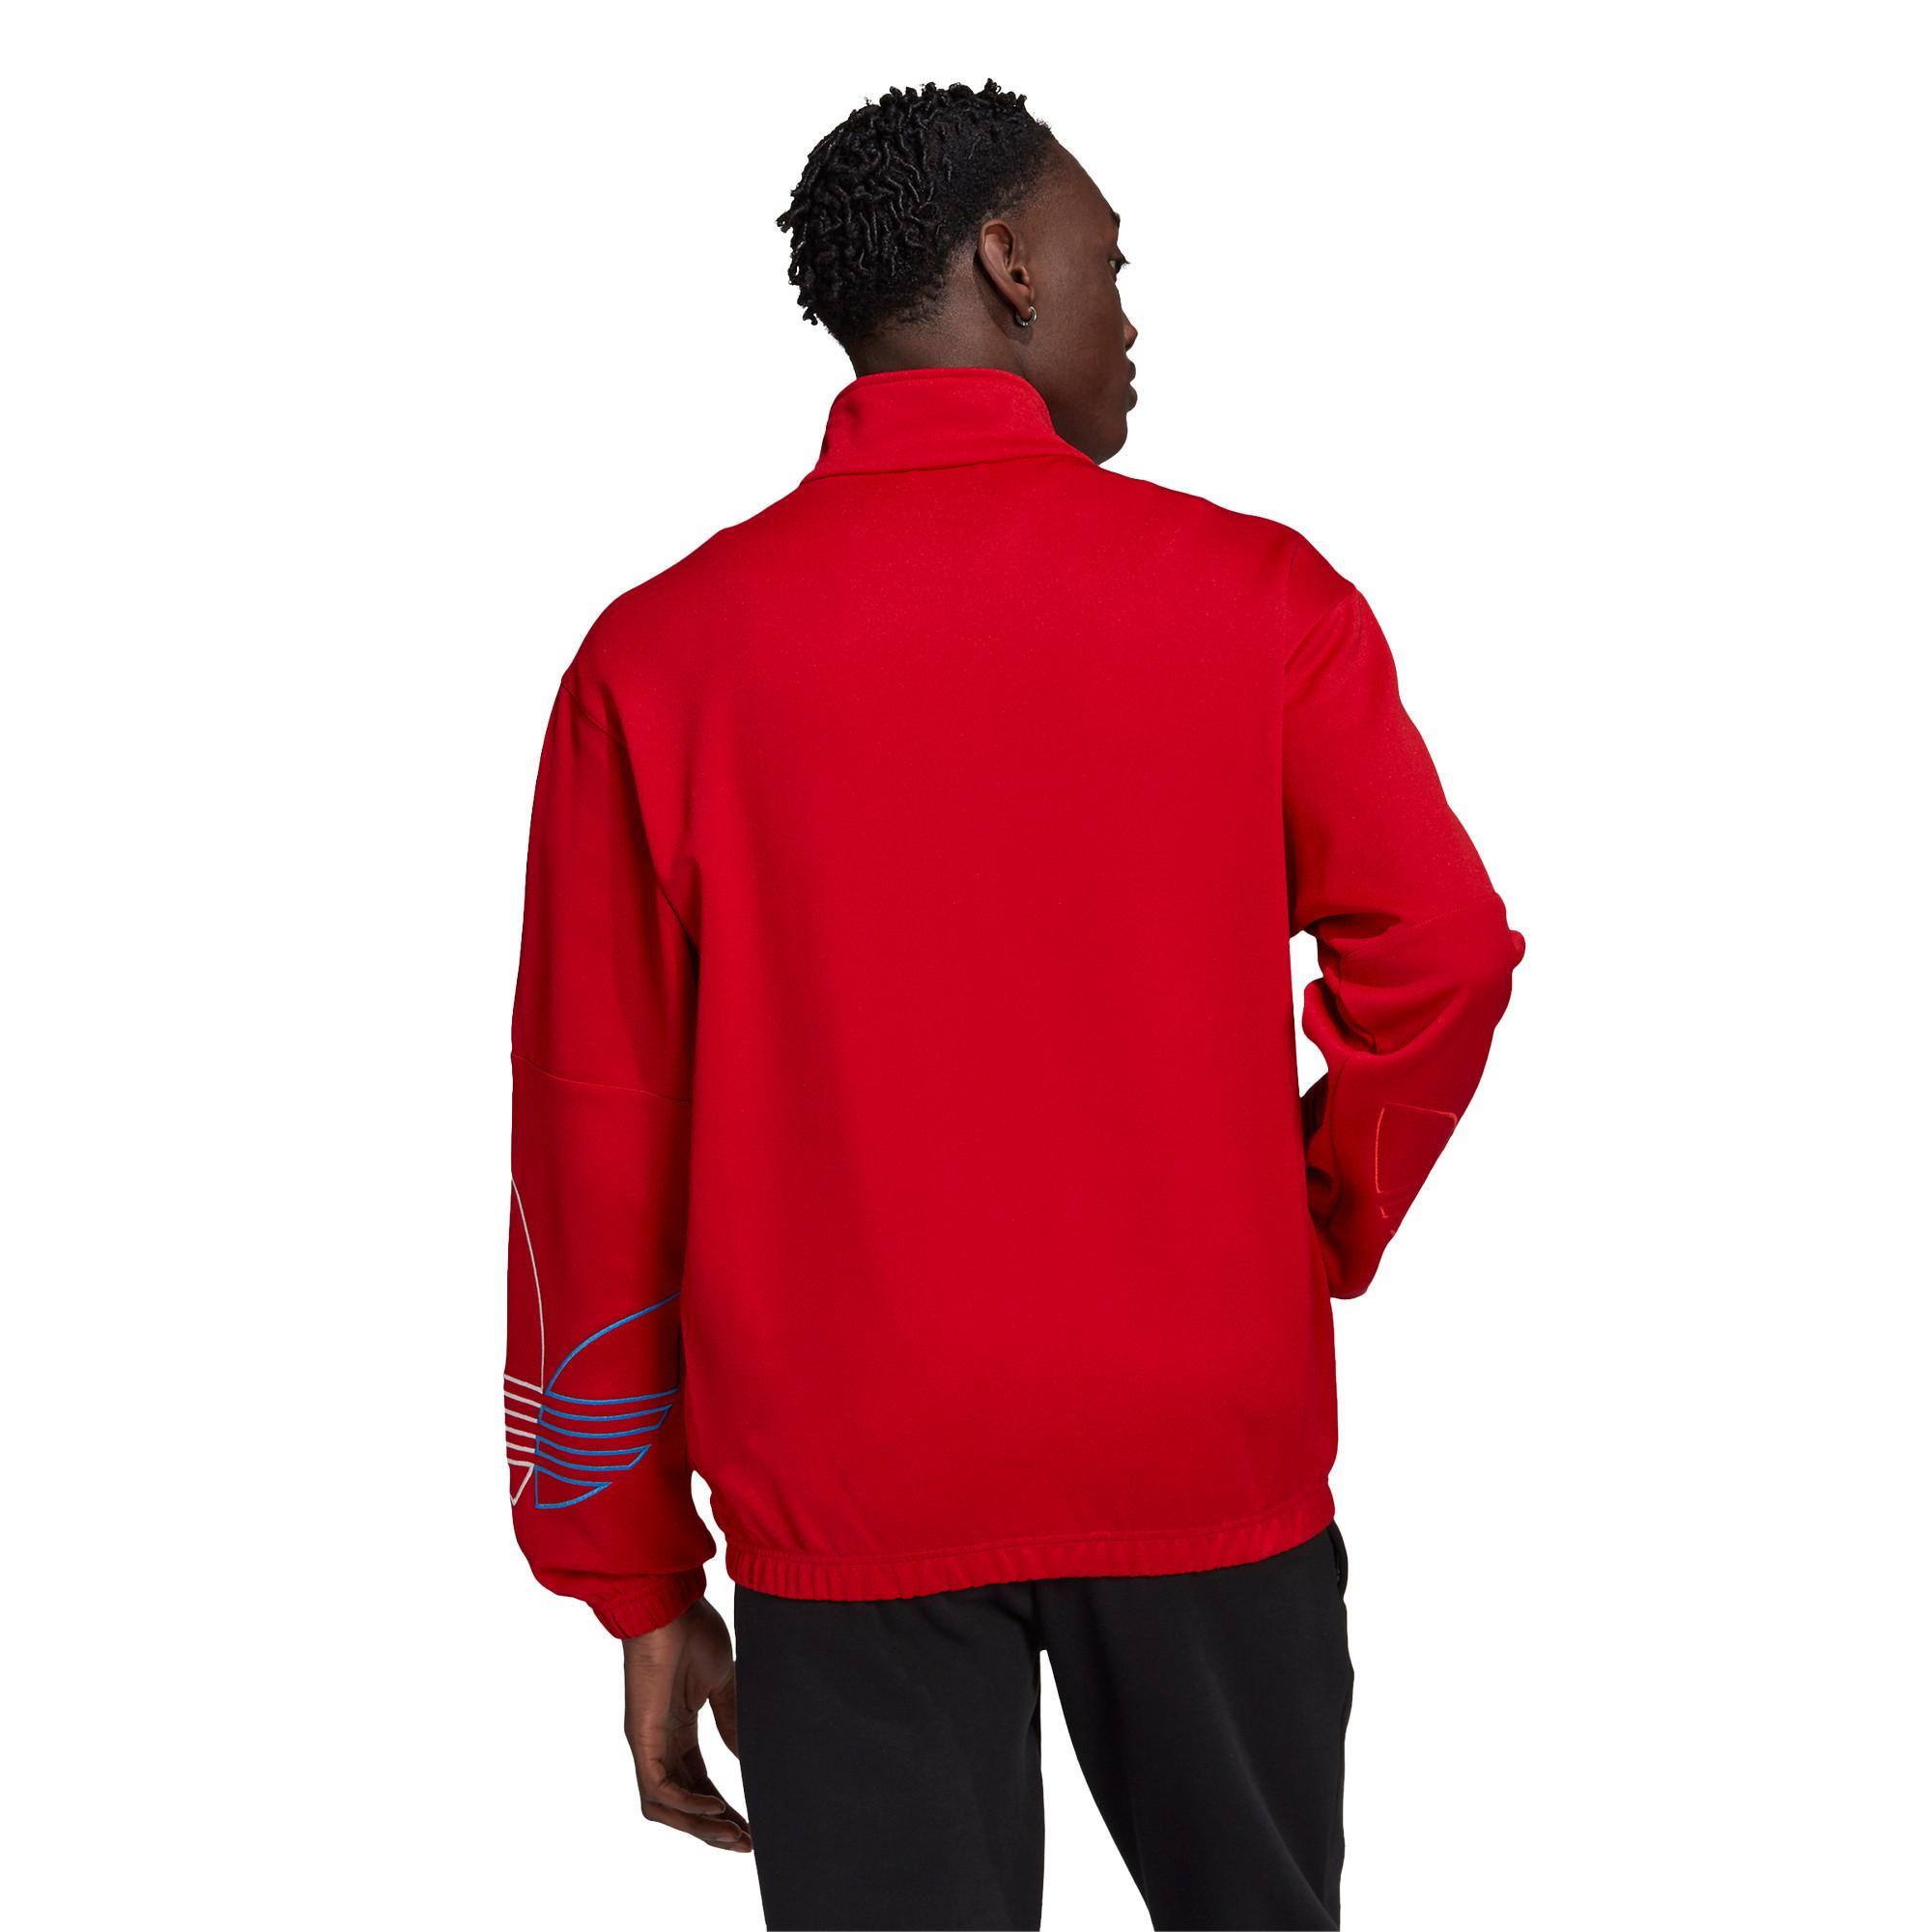 Giacca tuta adicolor FTO Track Jacket, Rosso, large image number 1